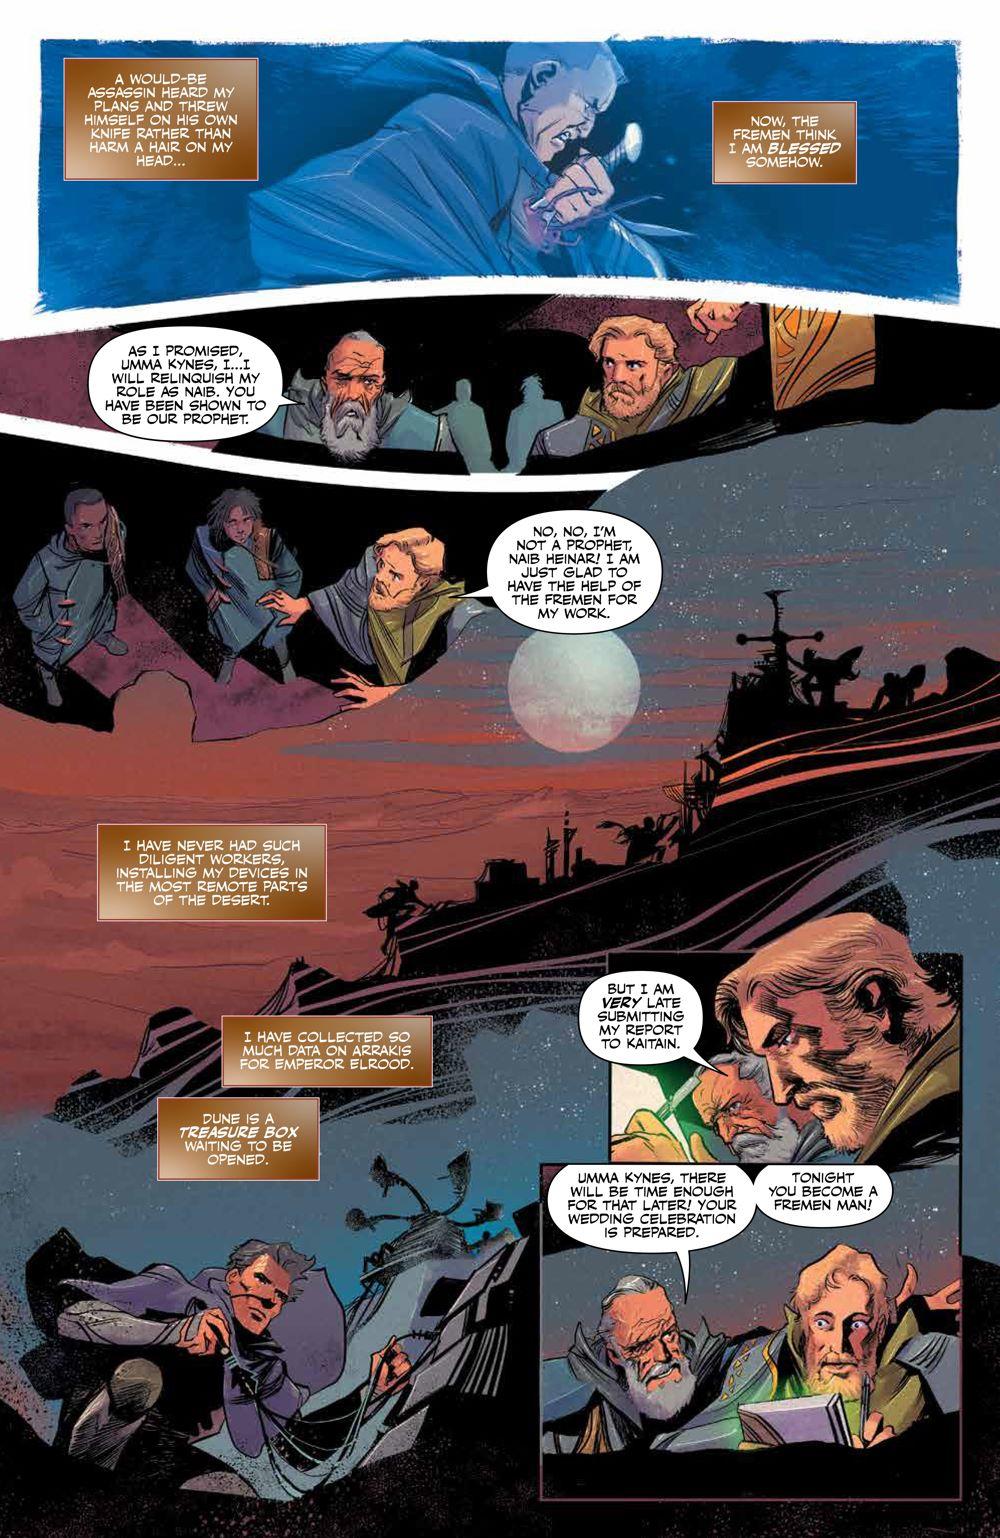 Dune_HouseAtreides_007_PRESS_4 ComicList Previews: DUNE HOUSE ATREIDES #7 (OF 12)